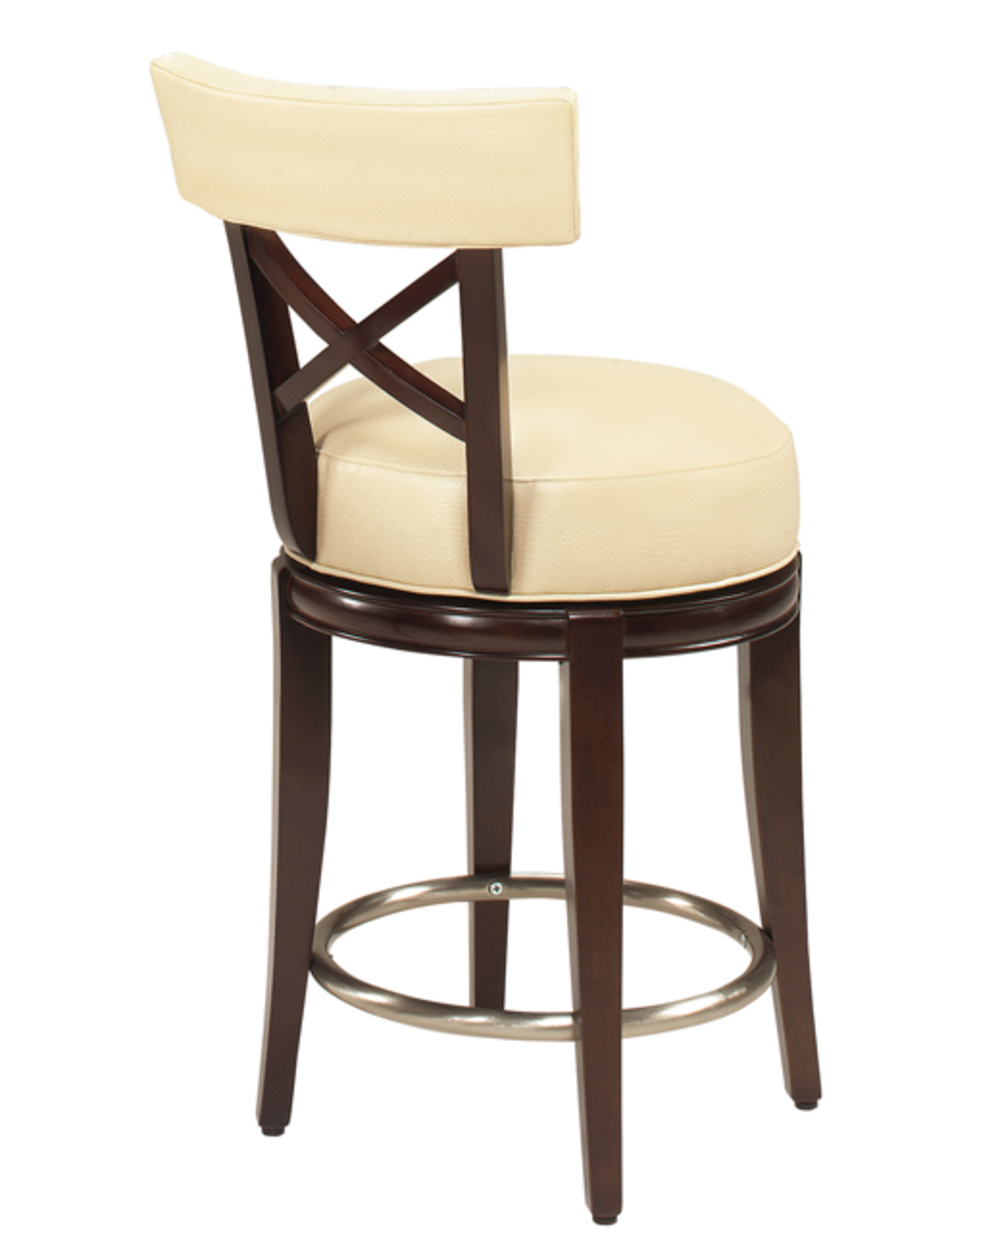 Designmaster Furniture - Dahlia Counter Stool